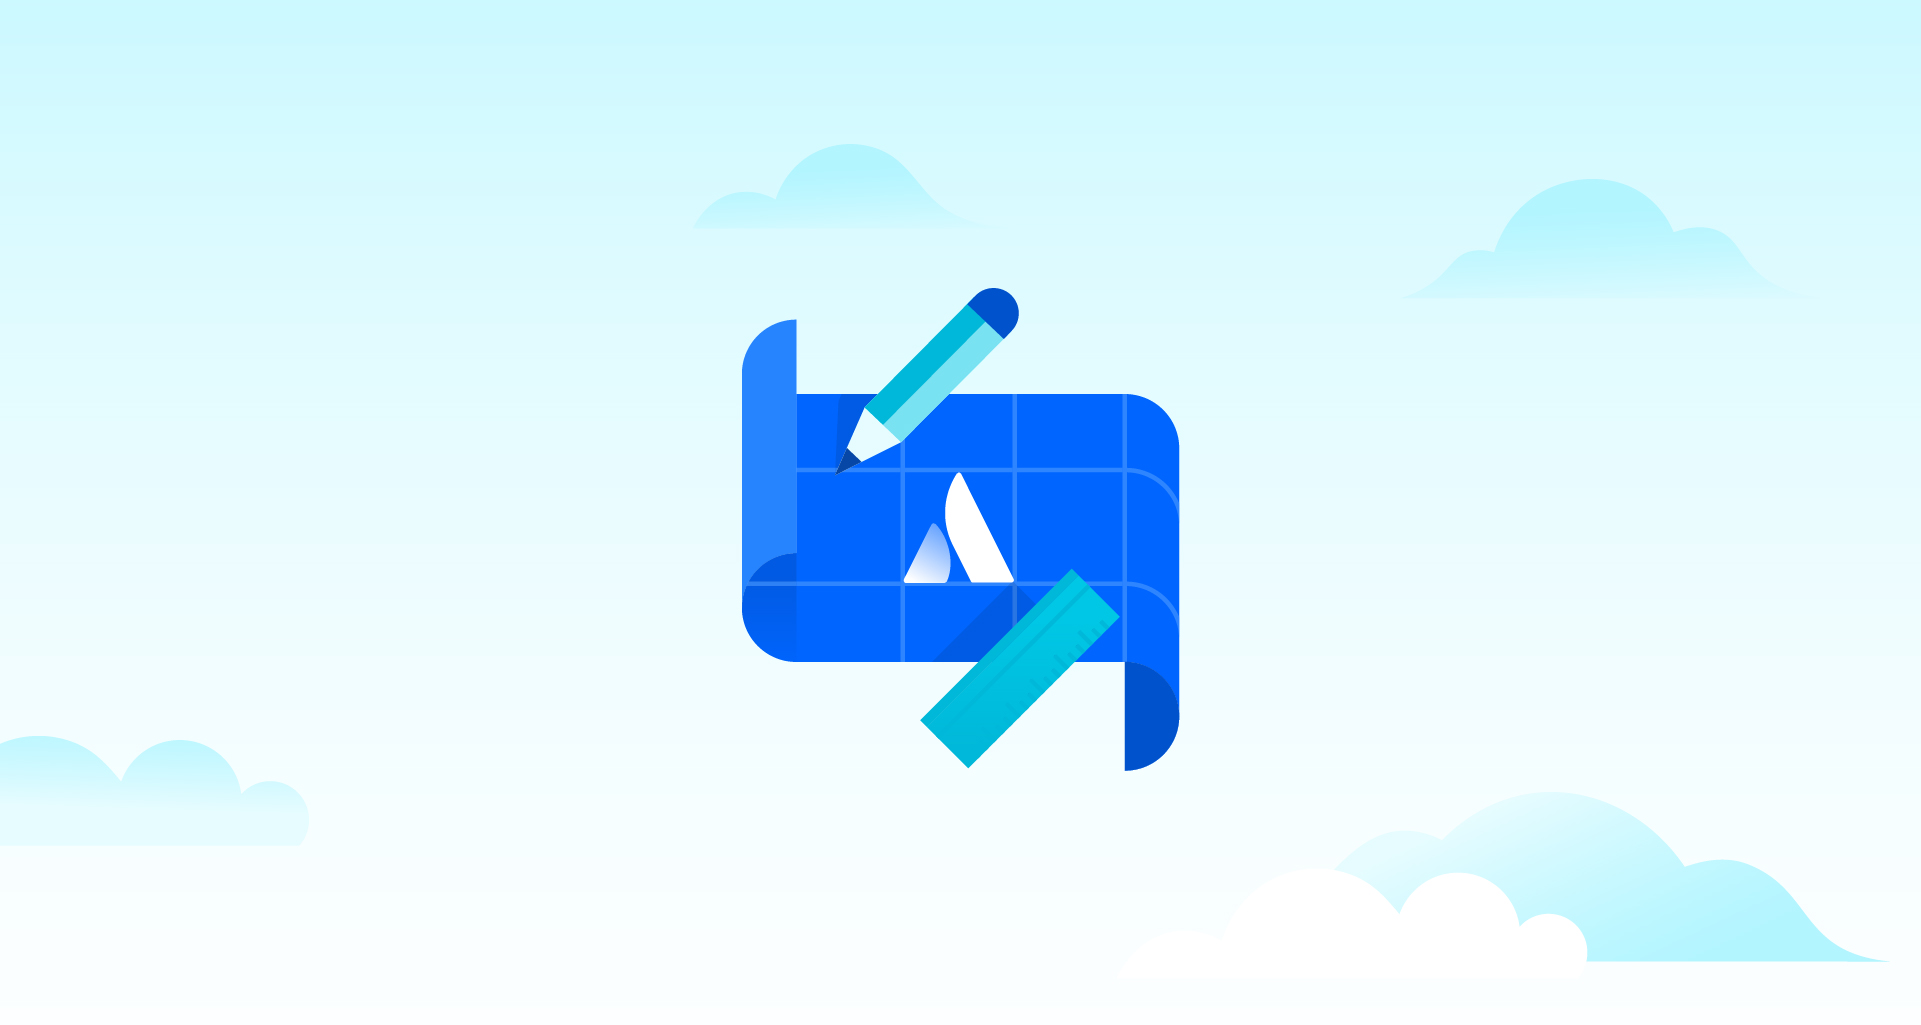 Atlassian blueprint illustration